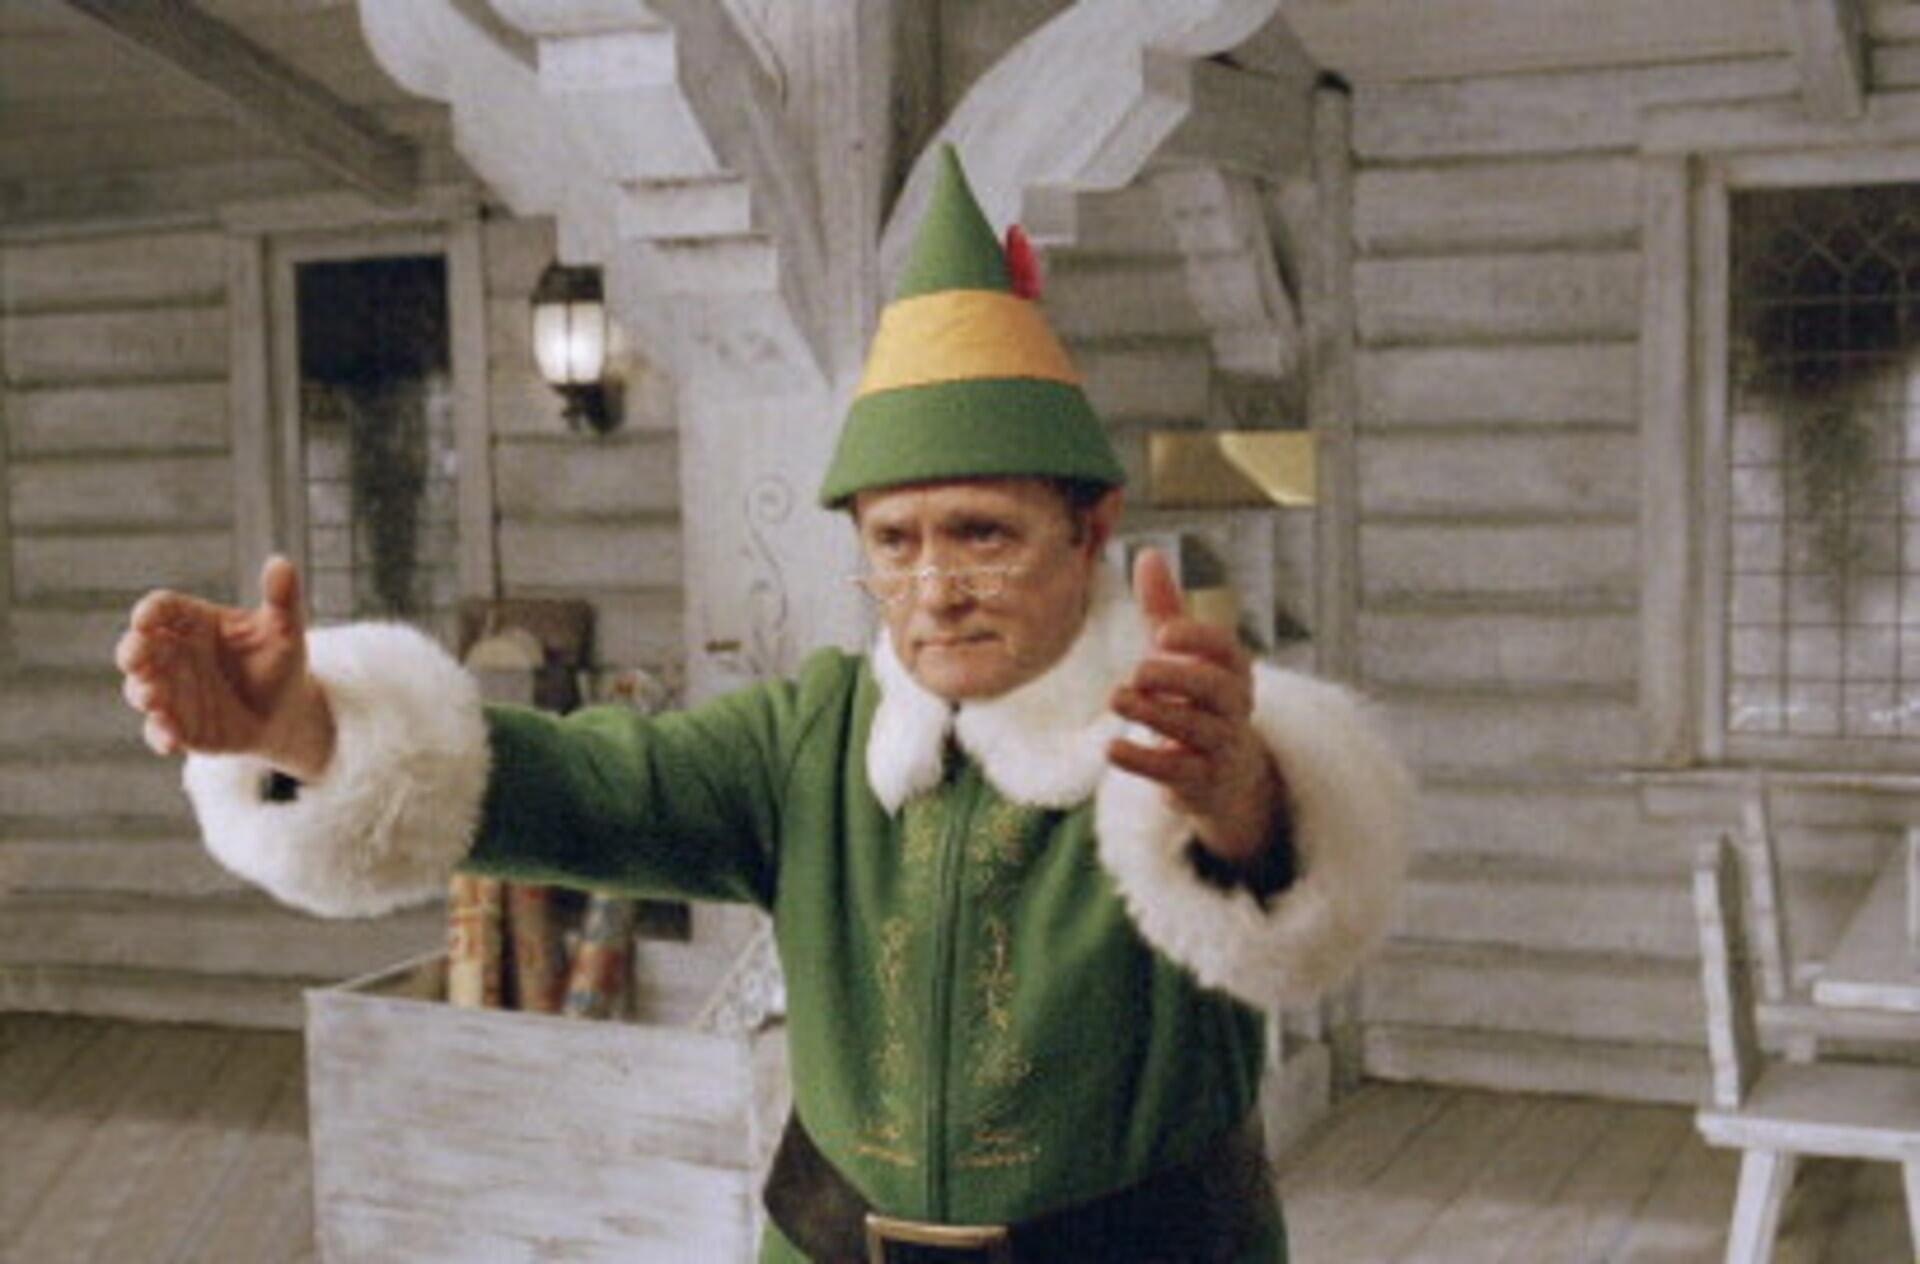 Elf - Image 1